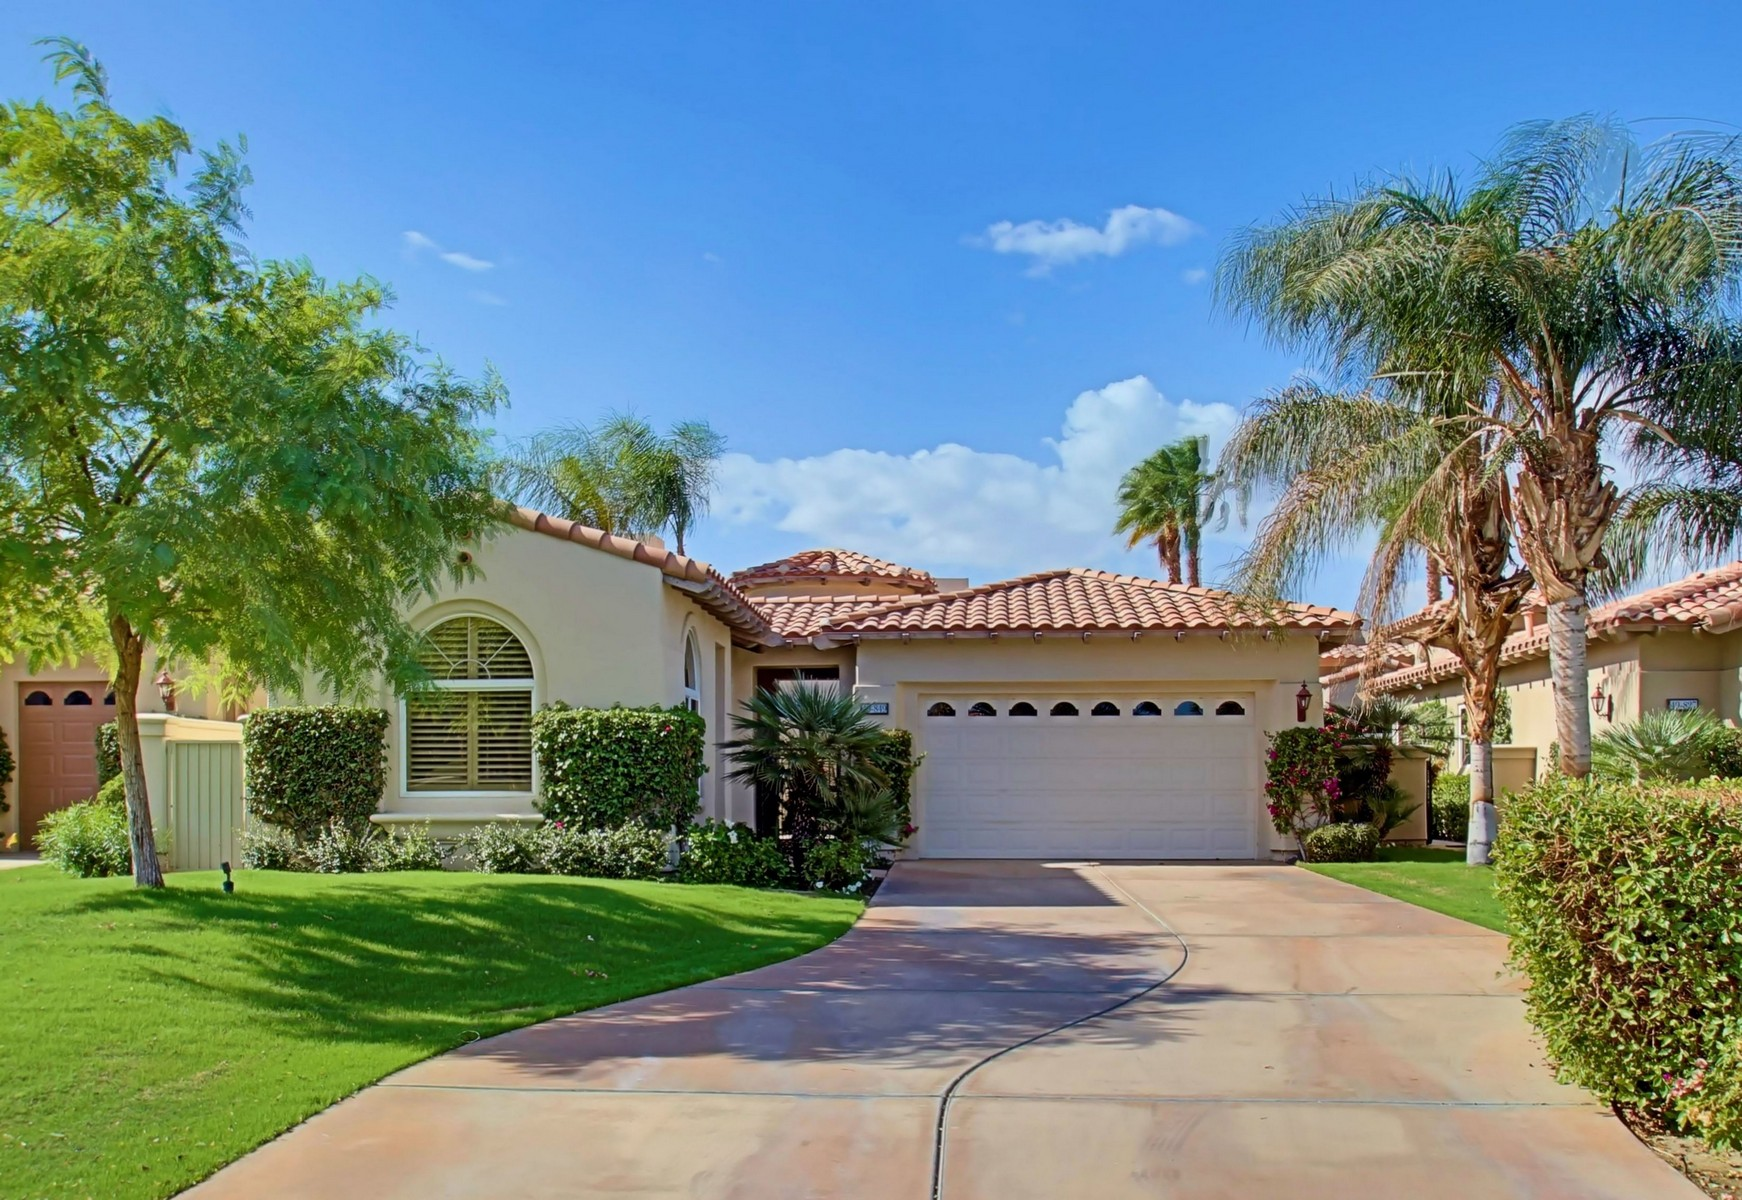 Single Family Home for Sale at 49849 Via Conquistador La Quinta, California 92253 United States